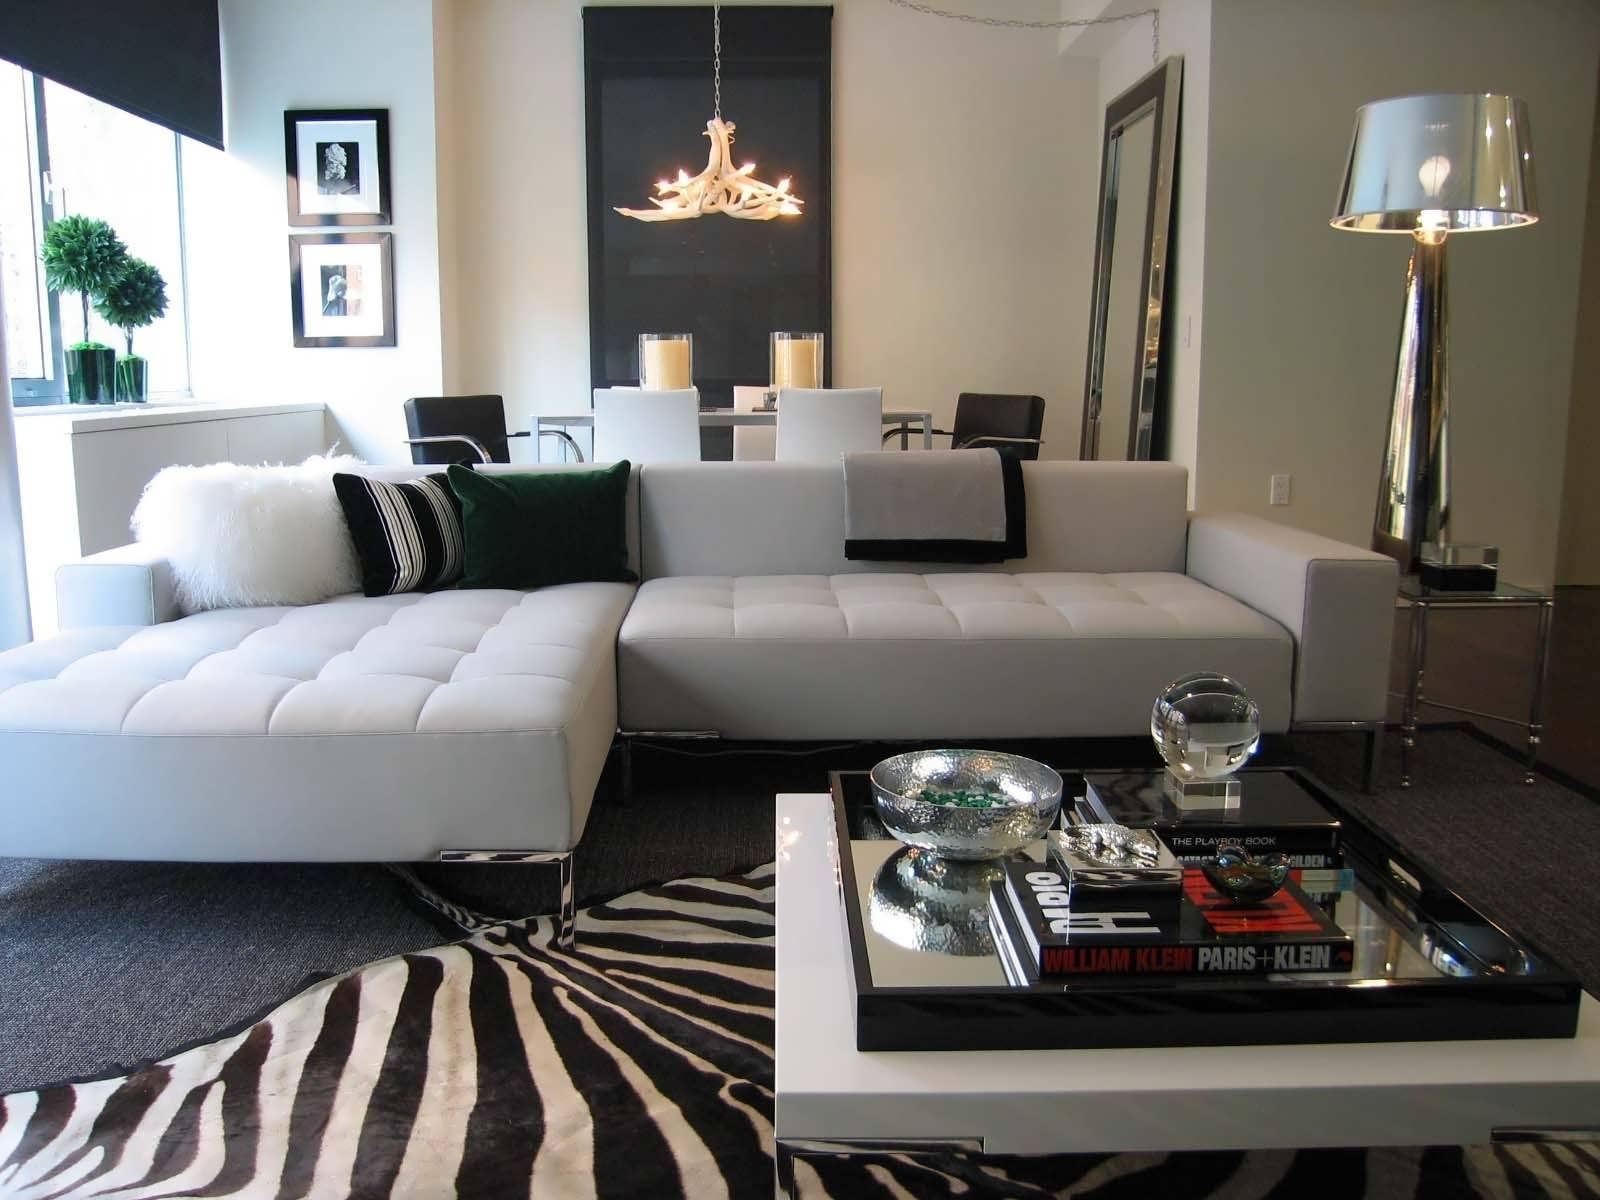 zebra print rug in living room 7 simple animal print rugs for living room HJZNOBZ